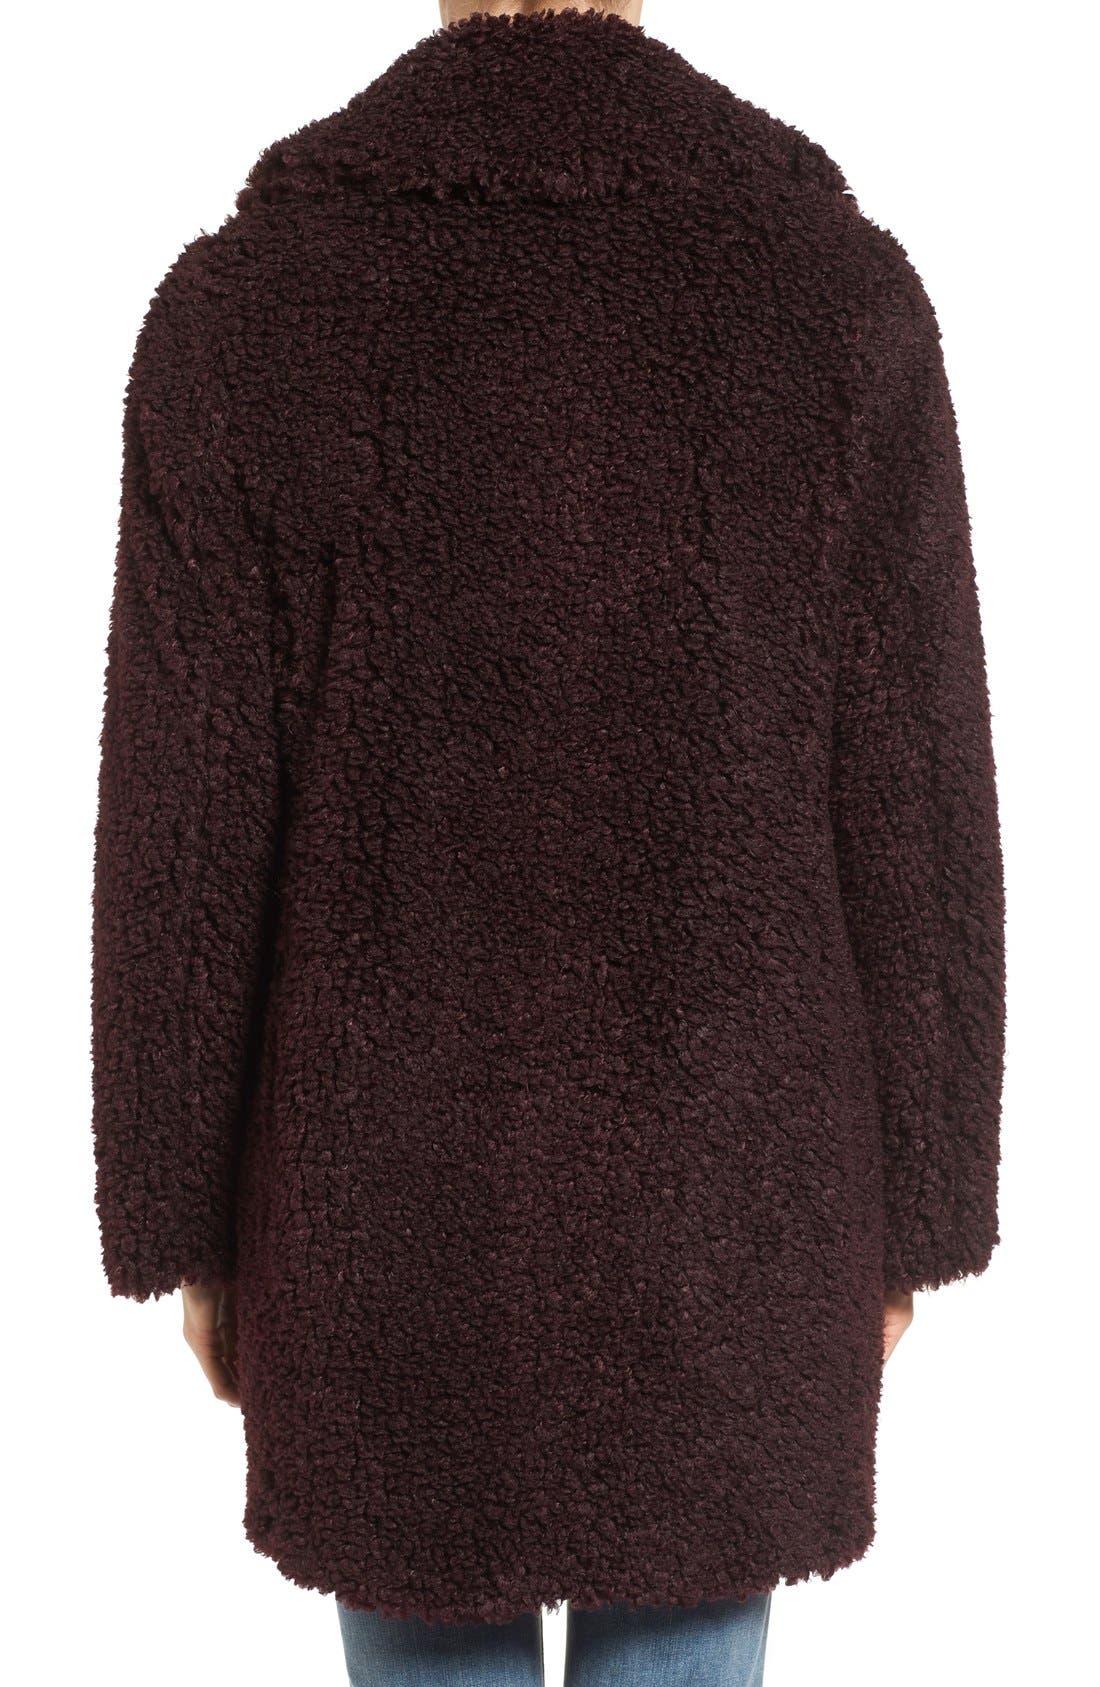 'Teddy Bear' Notch Collar Reversible Faux Fur Coat,                             Alternate thumbnail 22, color,